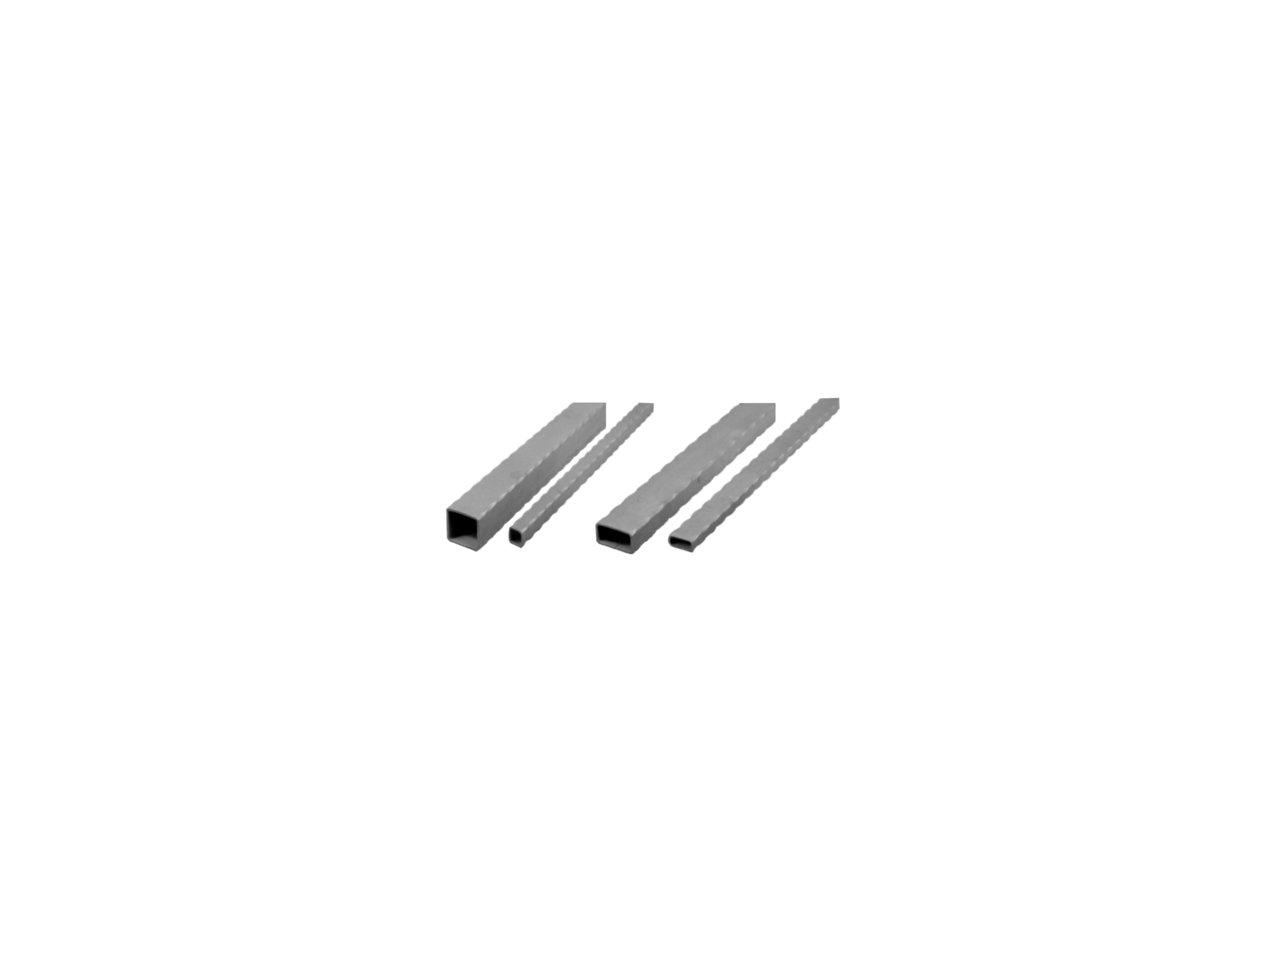 Stalowy profil 12.237 fi 40 x 40mm